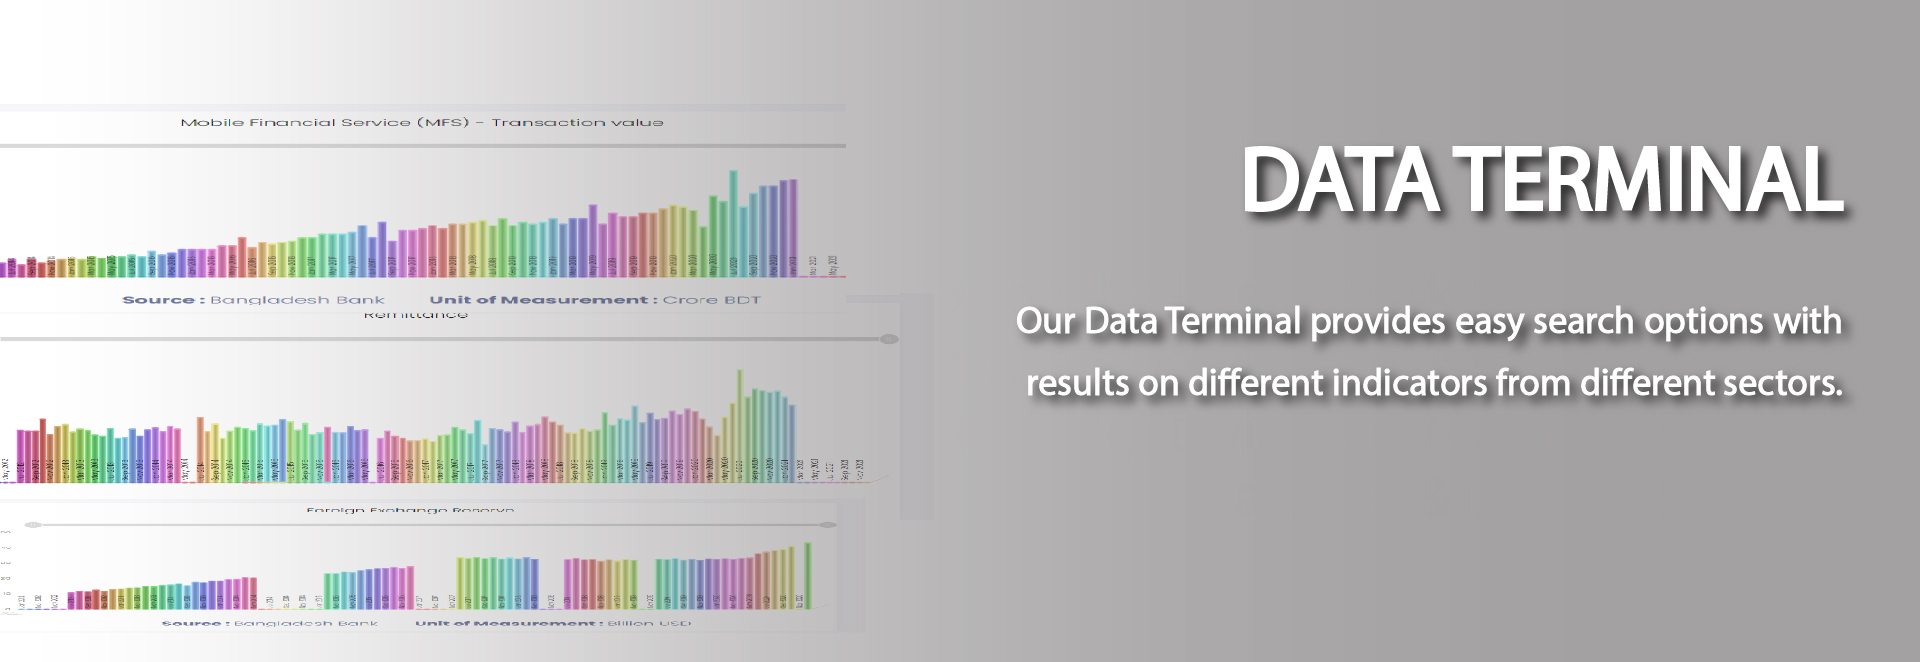 Data Terminal-01-01-01